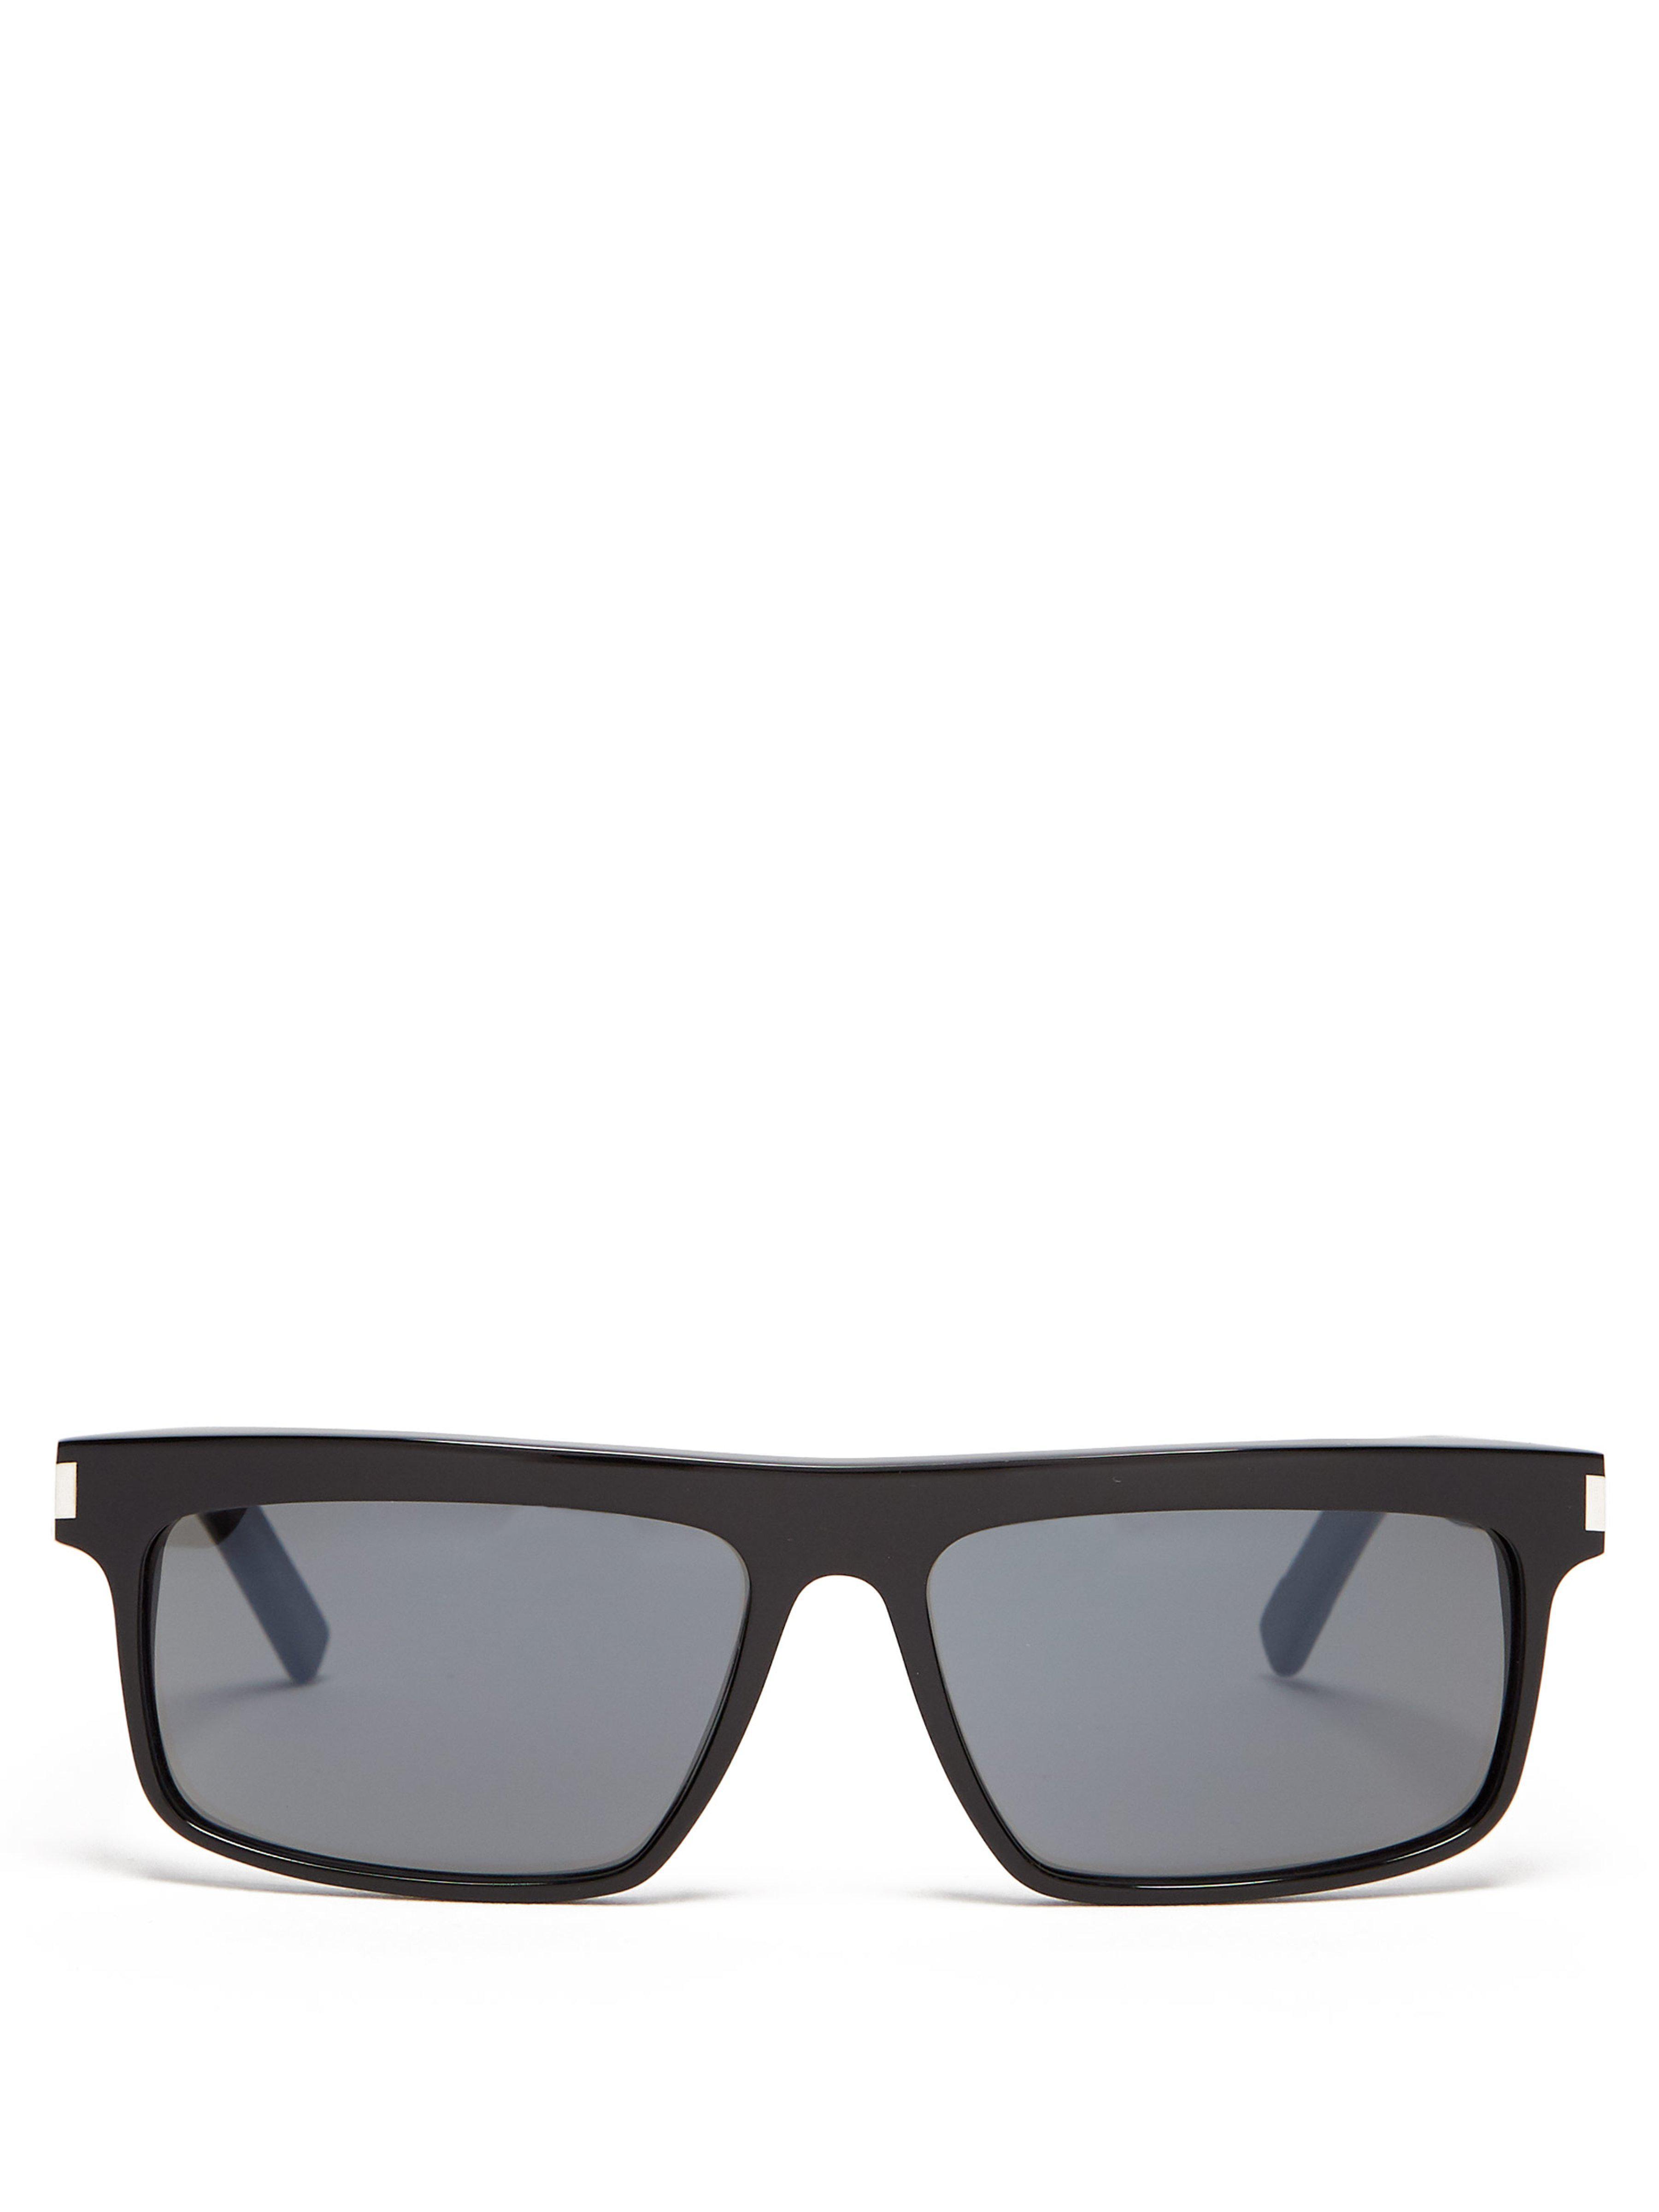 733b1652a053 Saint Laurent Square Frame Sunglasses in Black for Men - Lyst